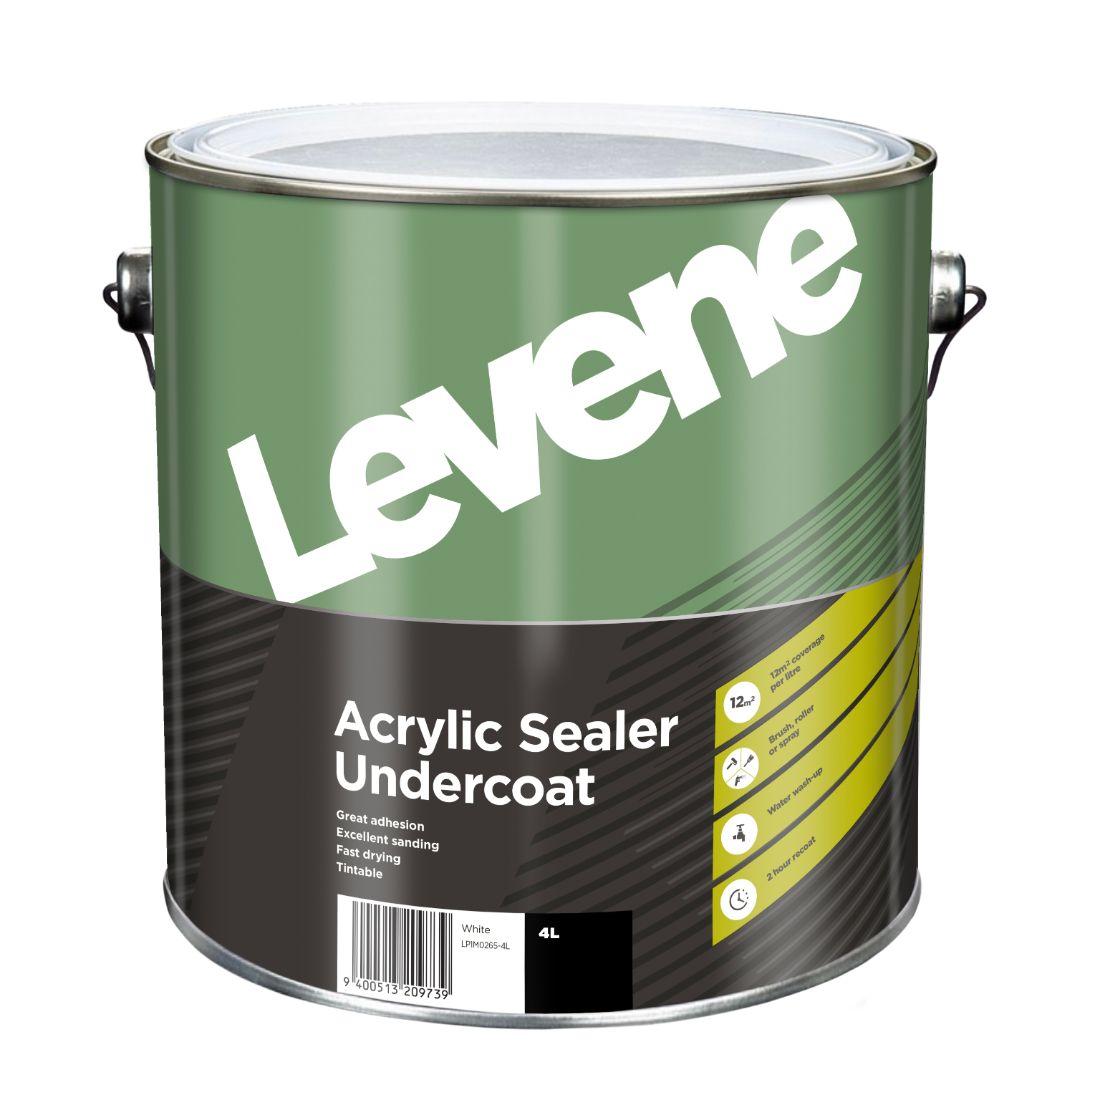 Acrylic Sealer Undercoat 4L